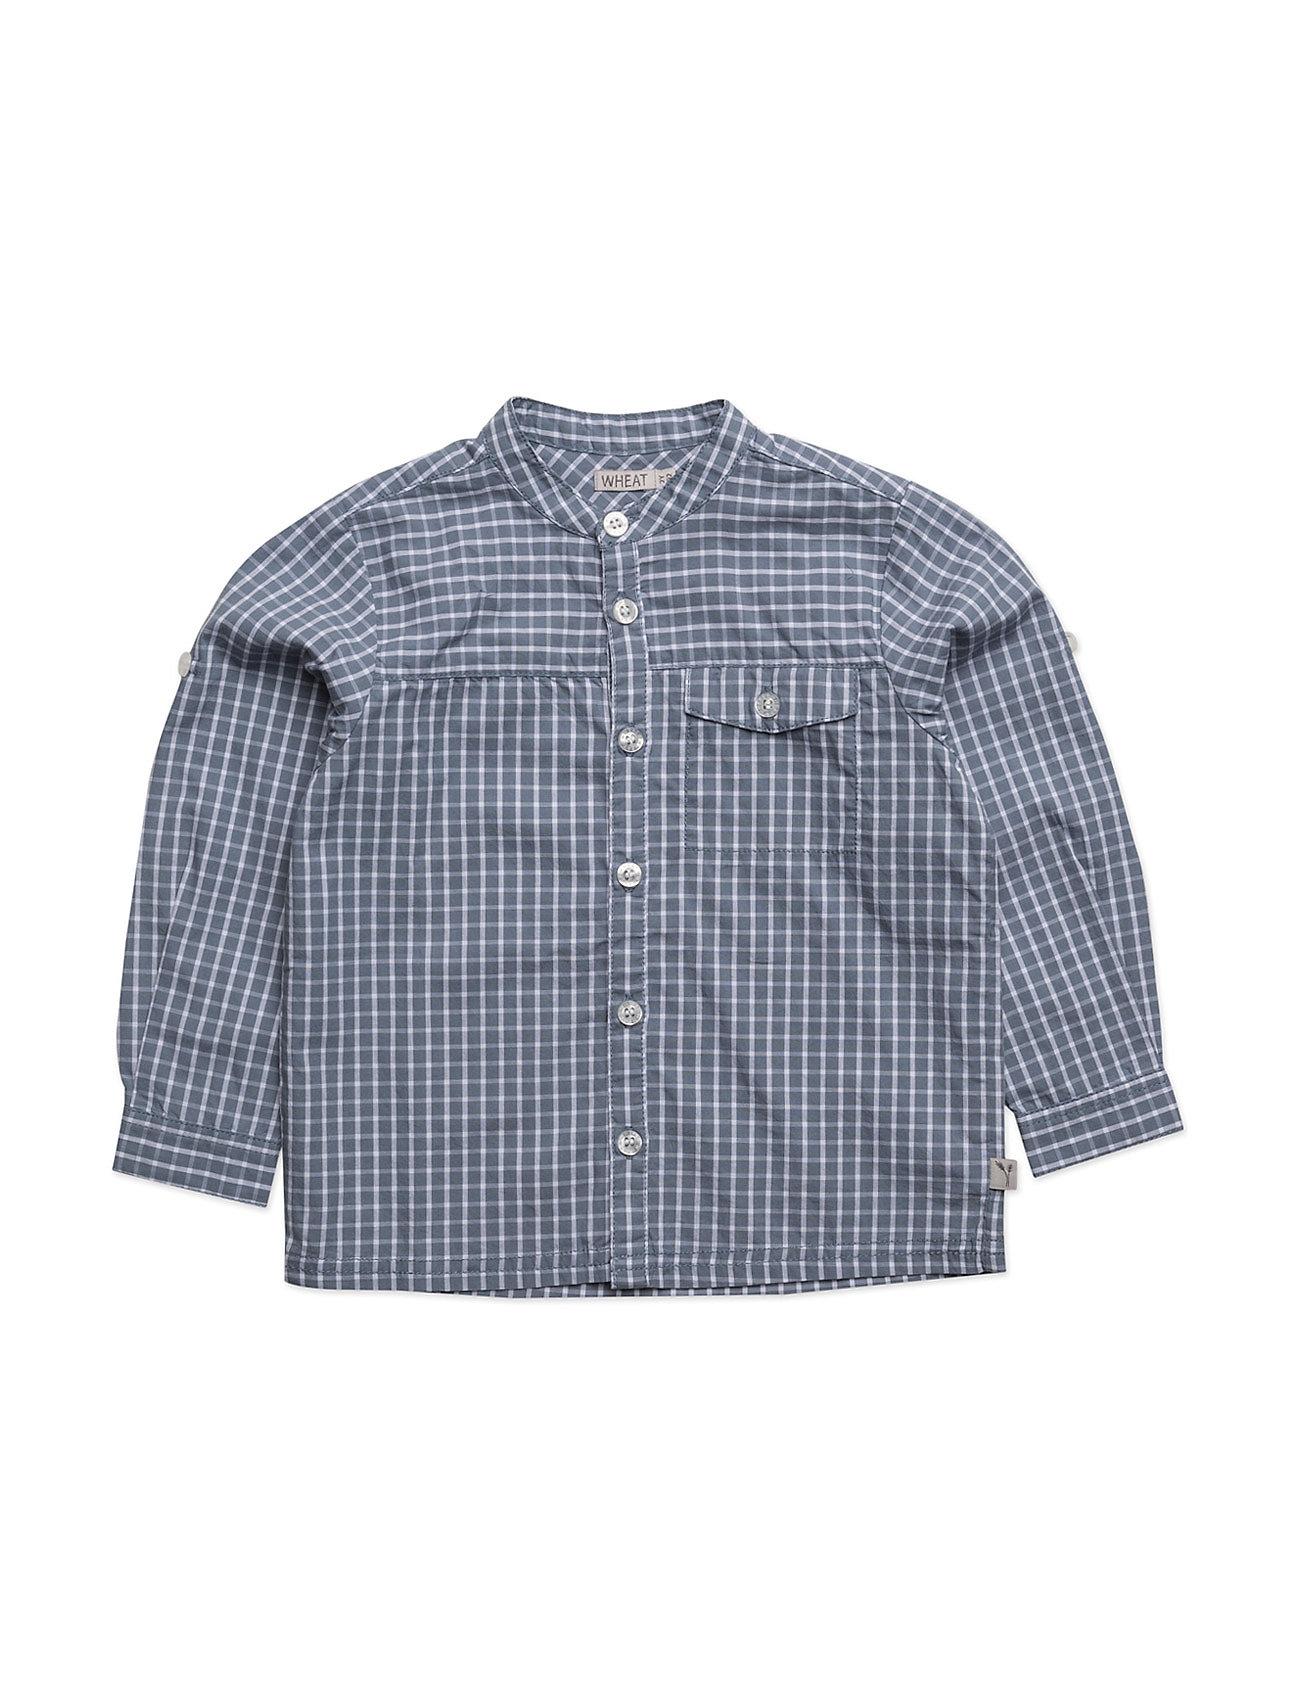 Wheat Shirt Axel LS